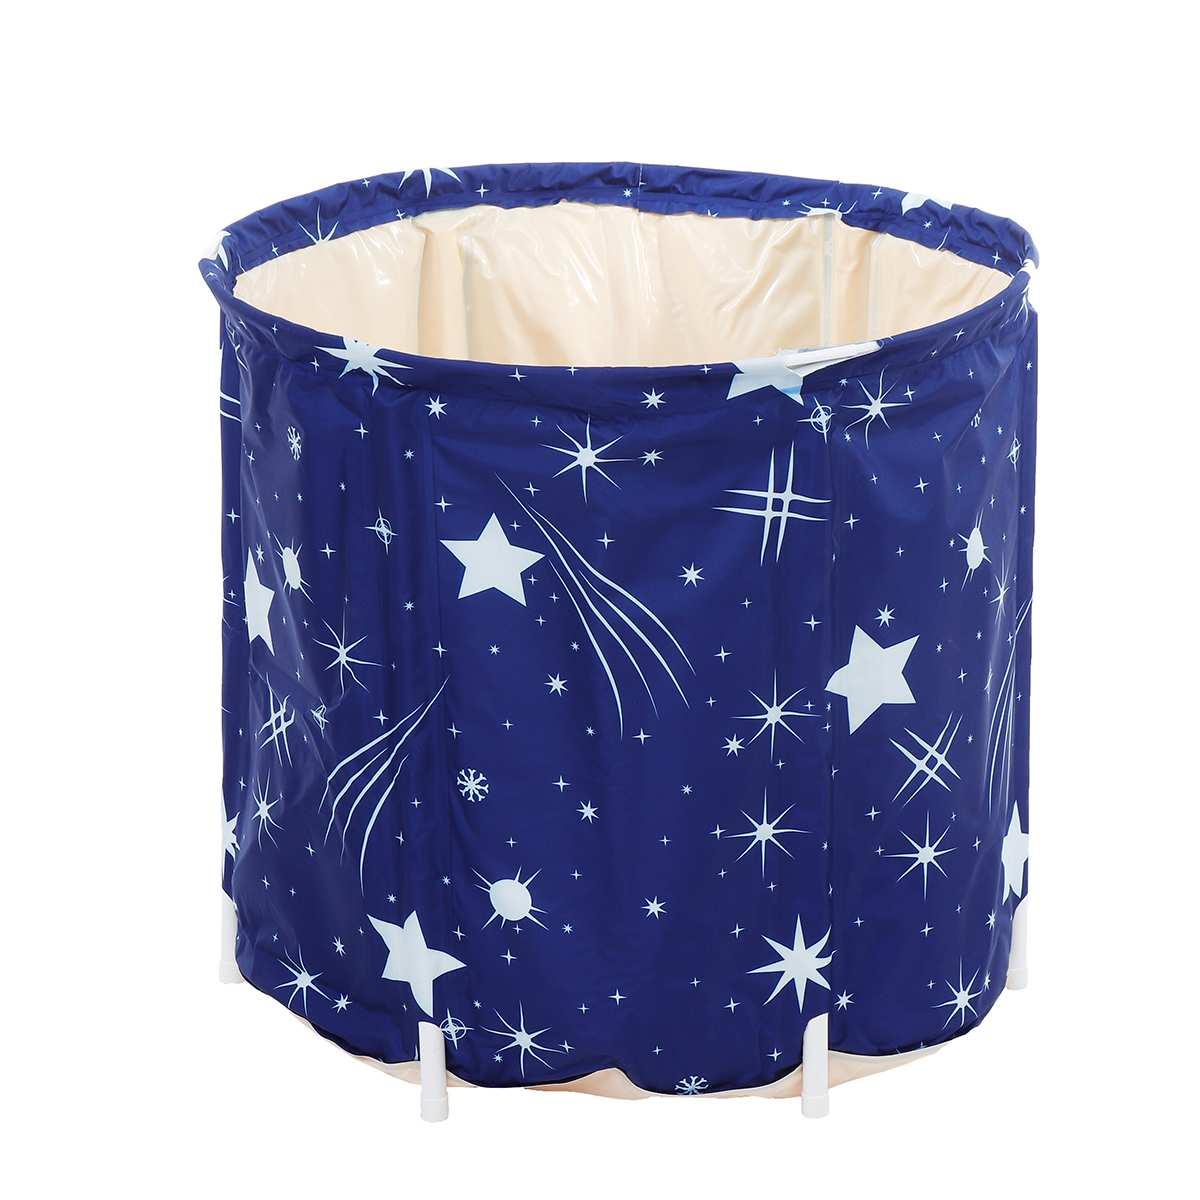 70cm*65cm Portable PVC Style Folding Fabric Bracket Adult Folding Bath Barrel Household Bathtubs Barrel Large Body Steam Barrel